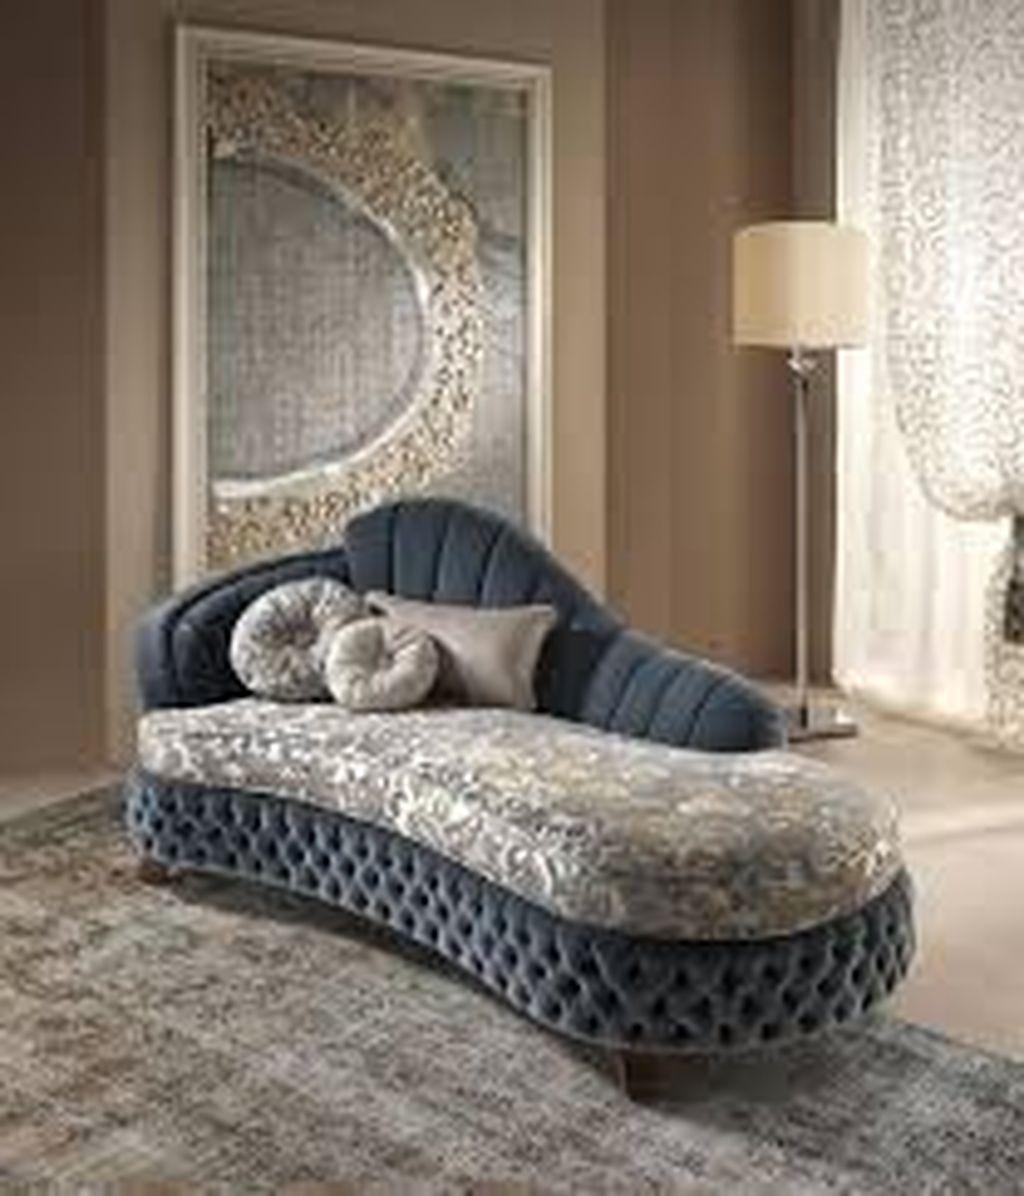 99 Adorable Classic Sofa Designs Ideas Classic Sofa Designs Modern Sofa Designs Living Room Sofa Design